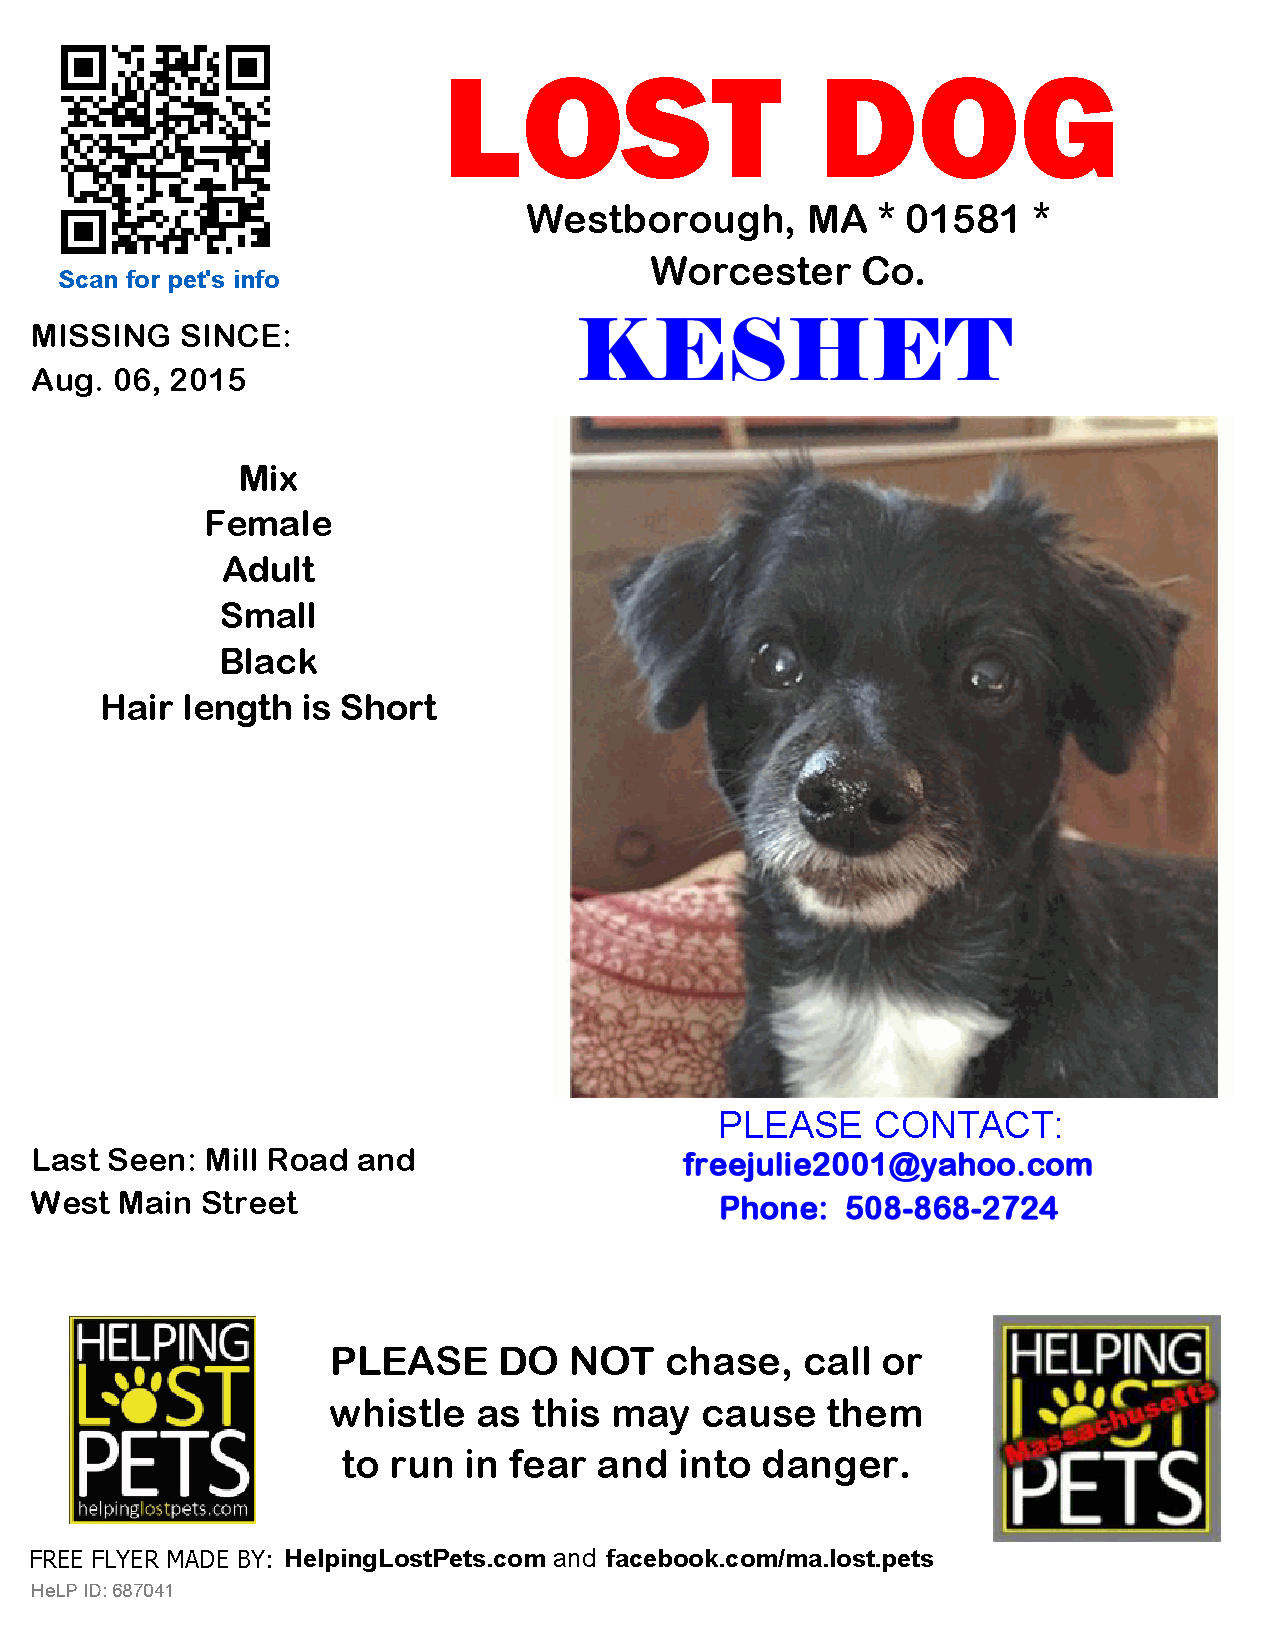 Lost Dog Female Westborough, MA, USA 01581 (With